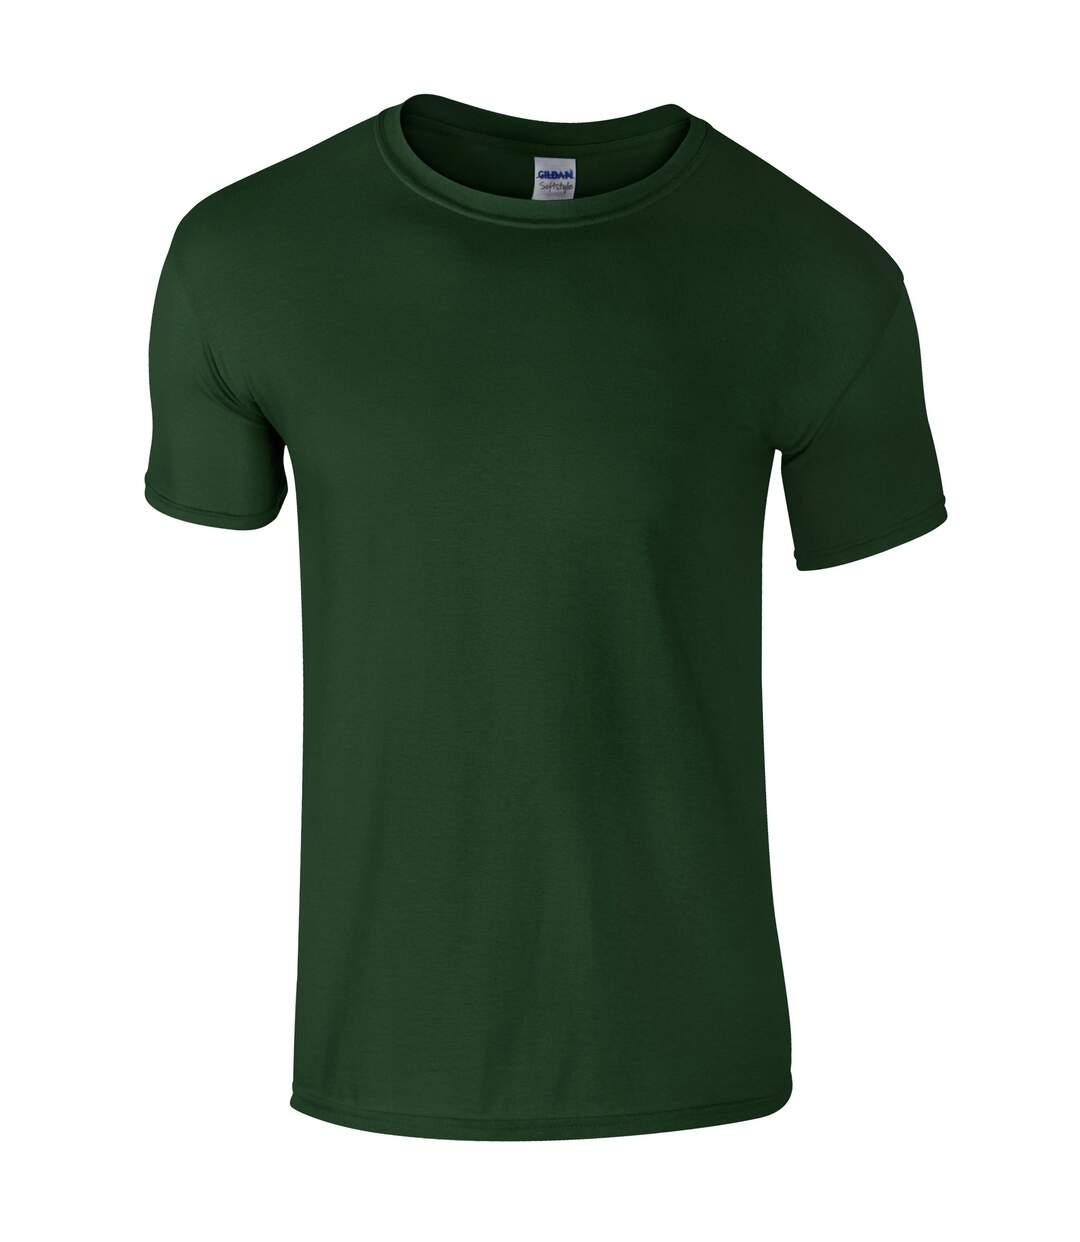 Gildan Mens Short Sleeve Soft-Style T-Shirt (Blackberry) - UTBC484